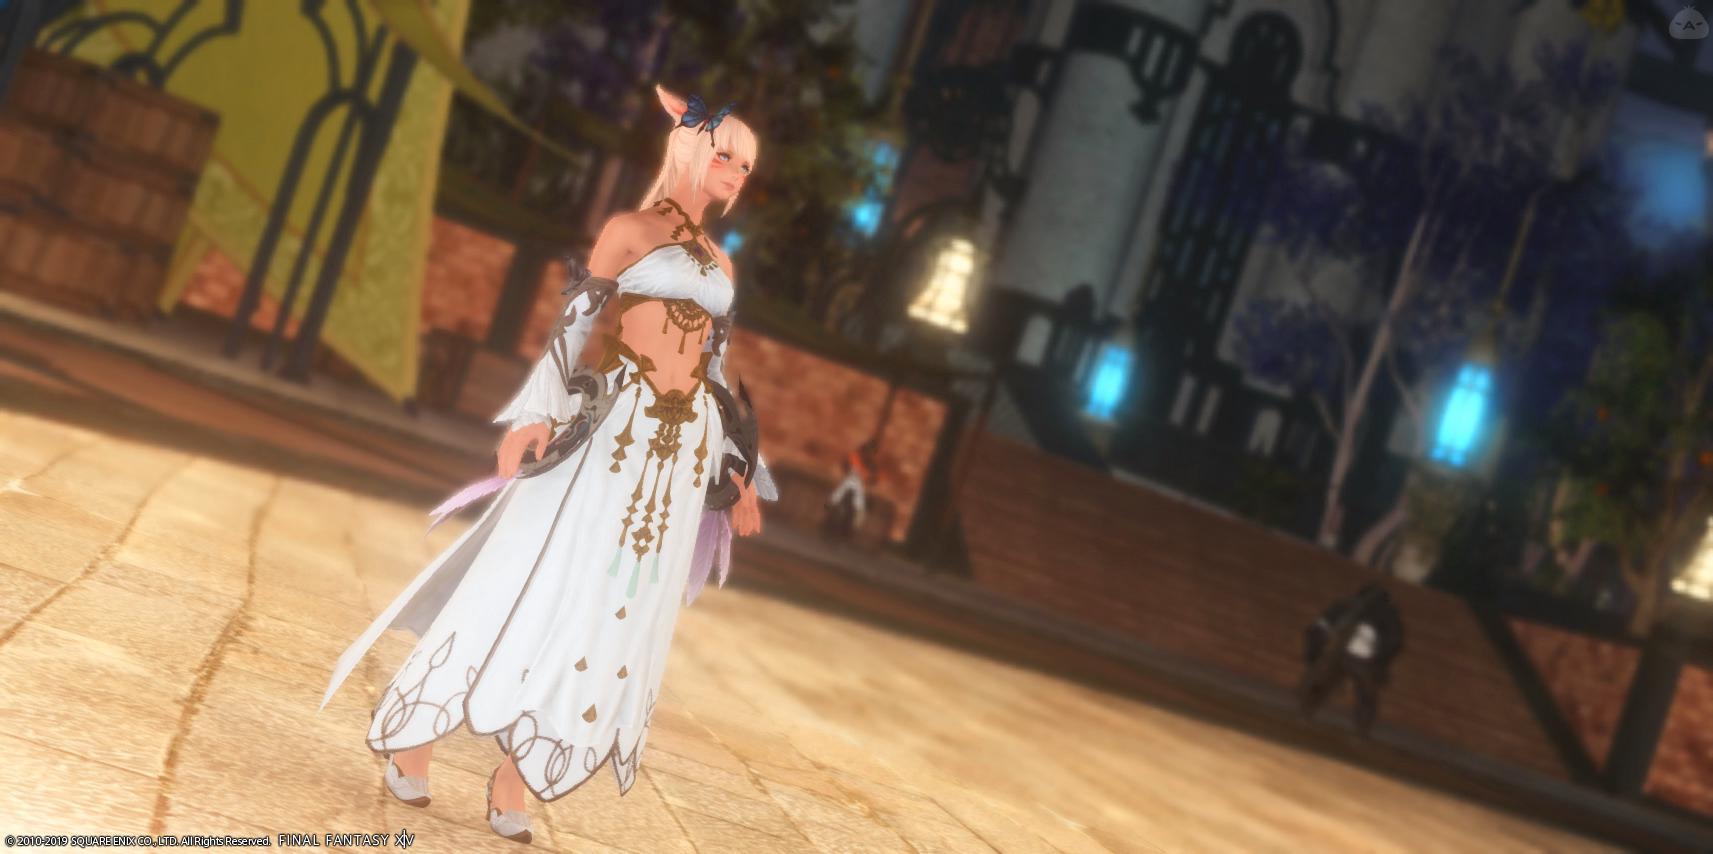 Princess dancer